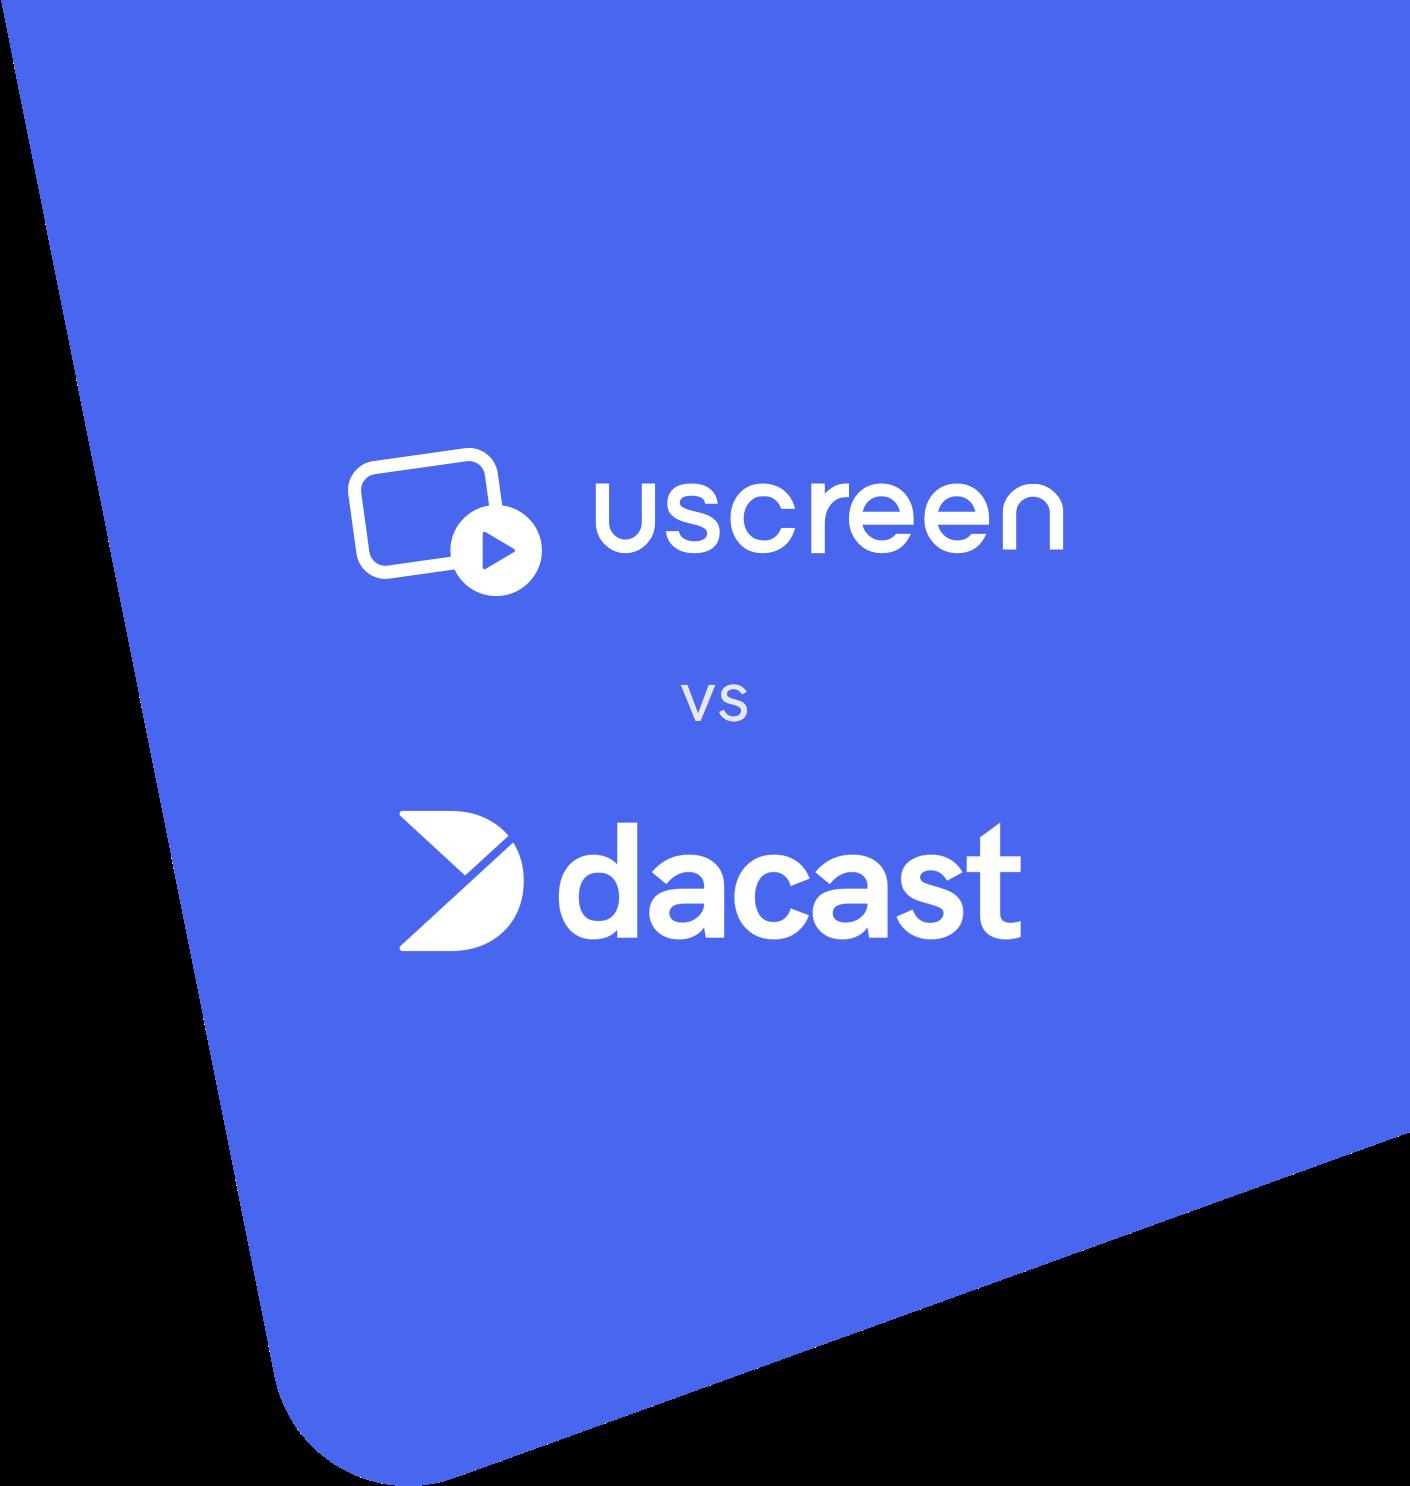 Uscreen vs Dacast